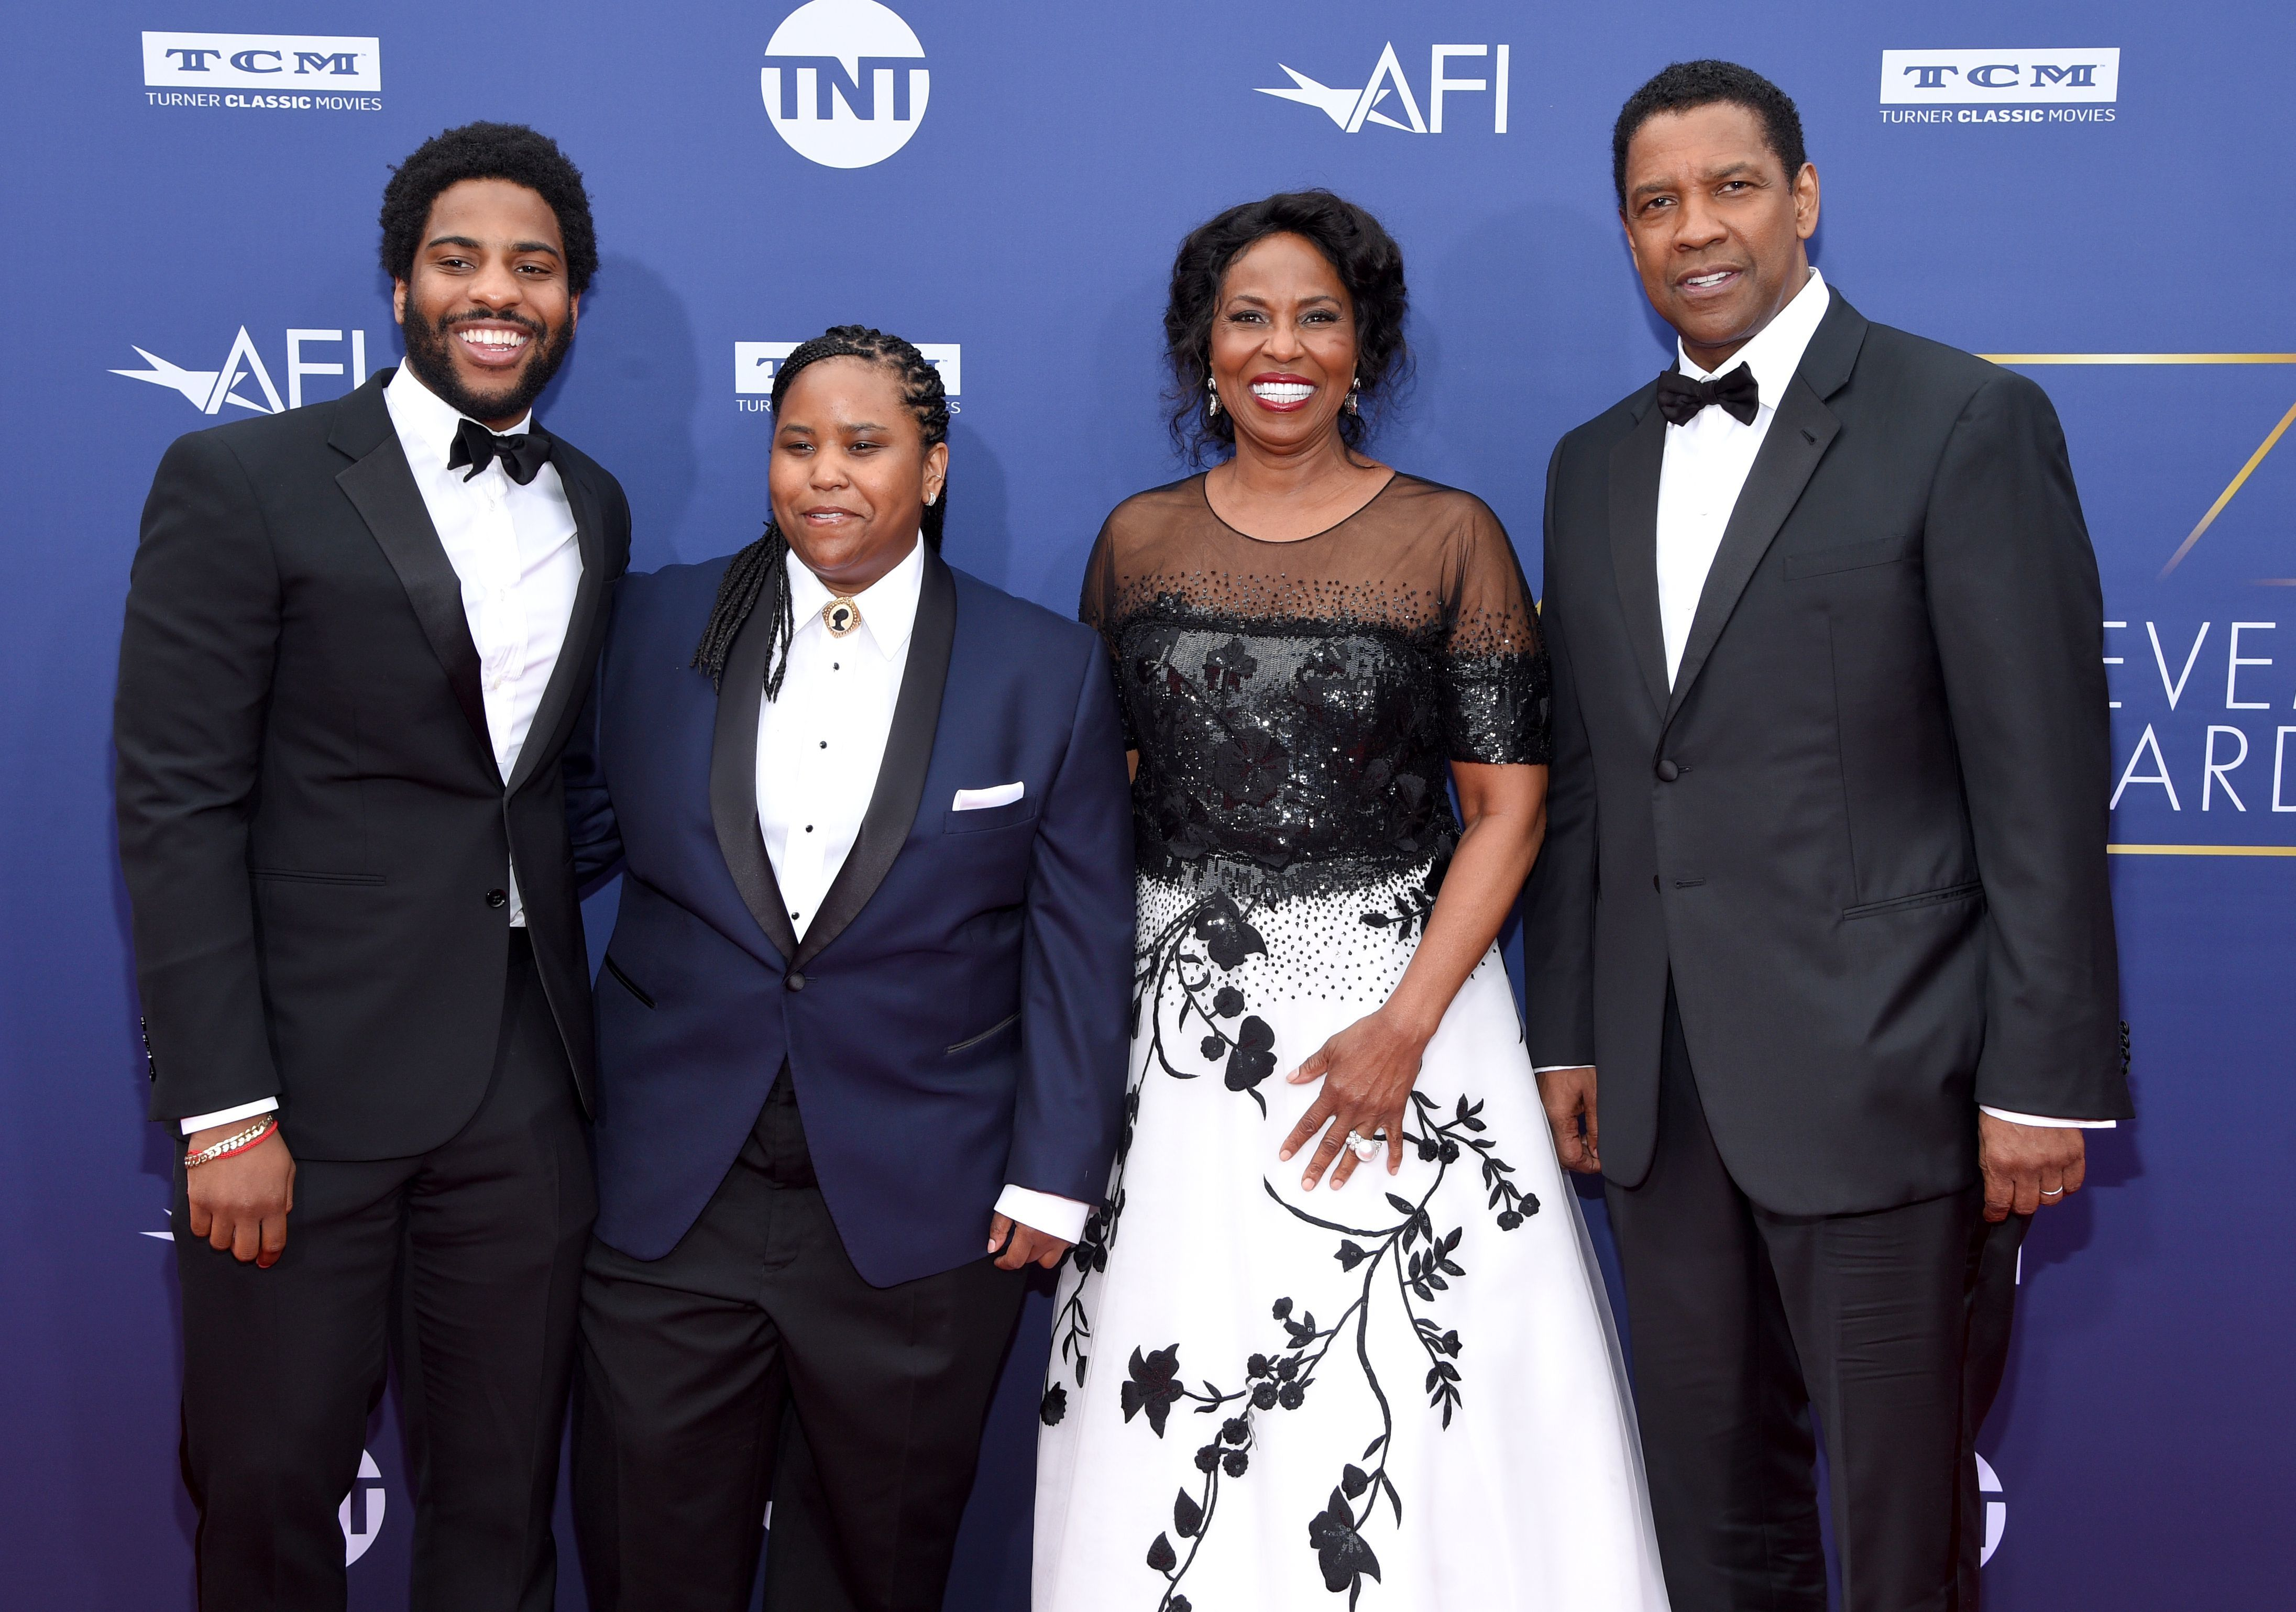 Malcolm Washington, Katia Washington, Pauletta Washington, and Denzel Washington attend the American Film Institute's 47th Life Achievement Award Gala Tribute To Denzel Washington at Dolby Theatre in Los Angeles on June 6, 2019.